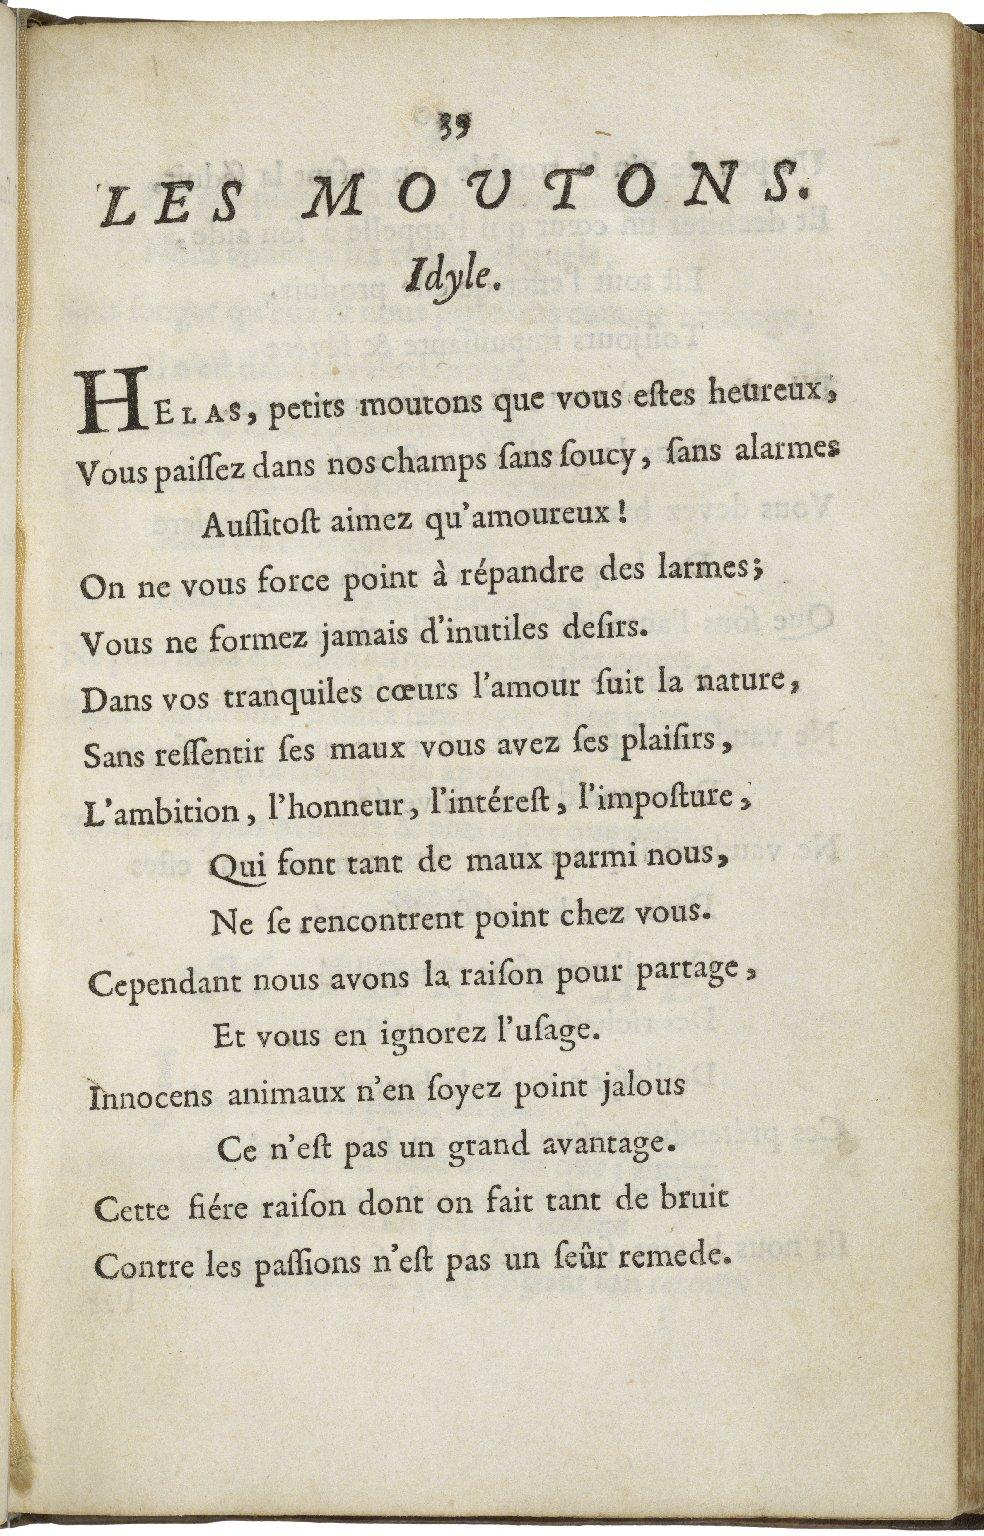 Poësies de Madame Deshoulieres.